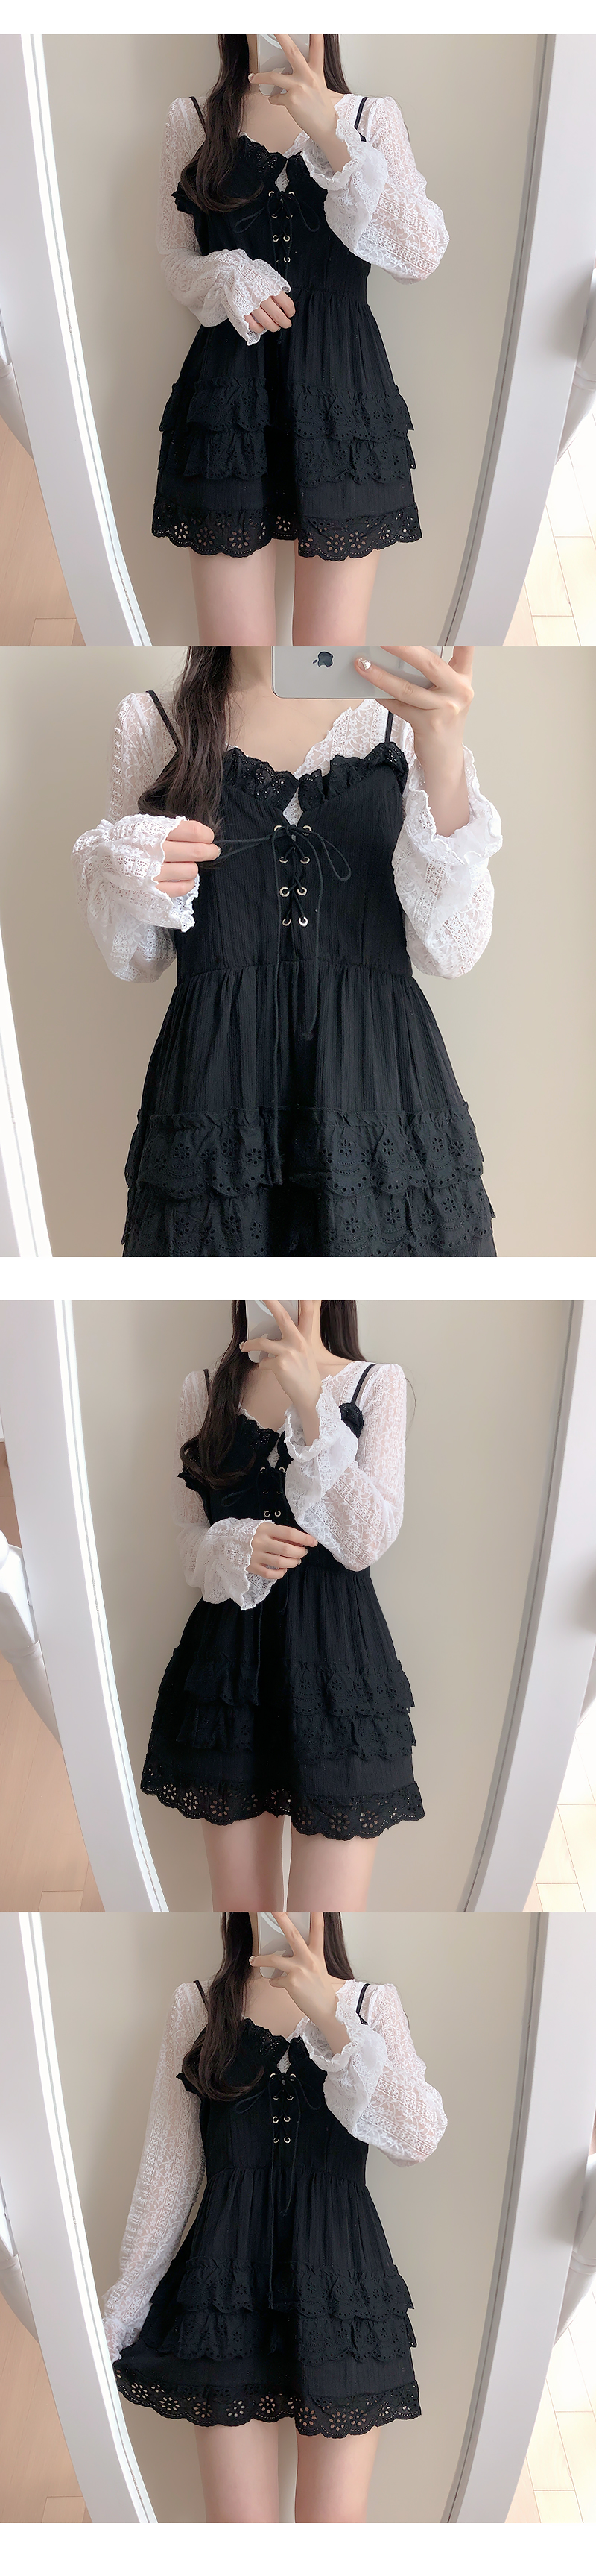 Eyelet punching lace thong dress